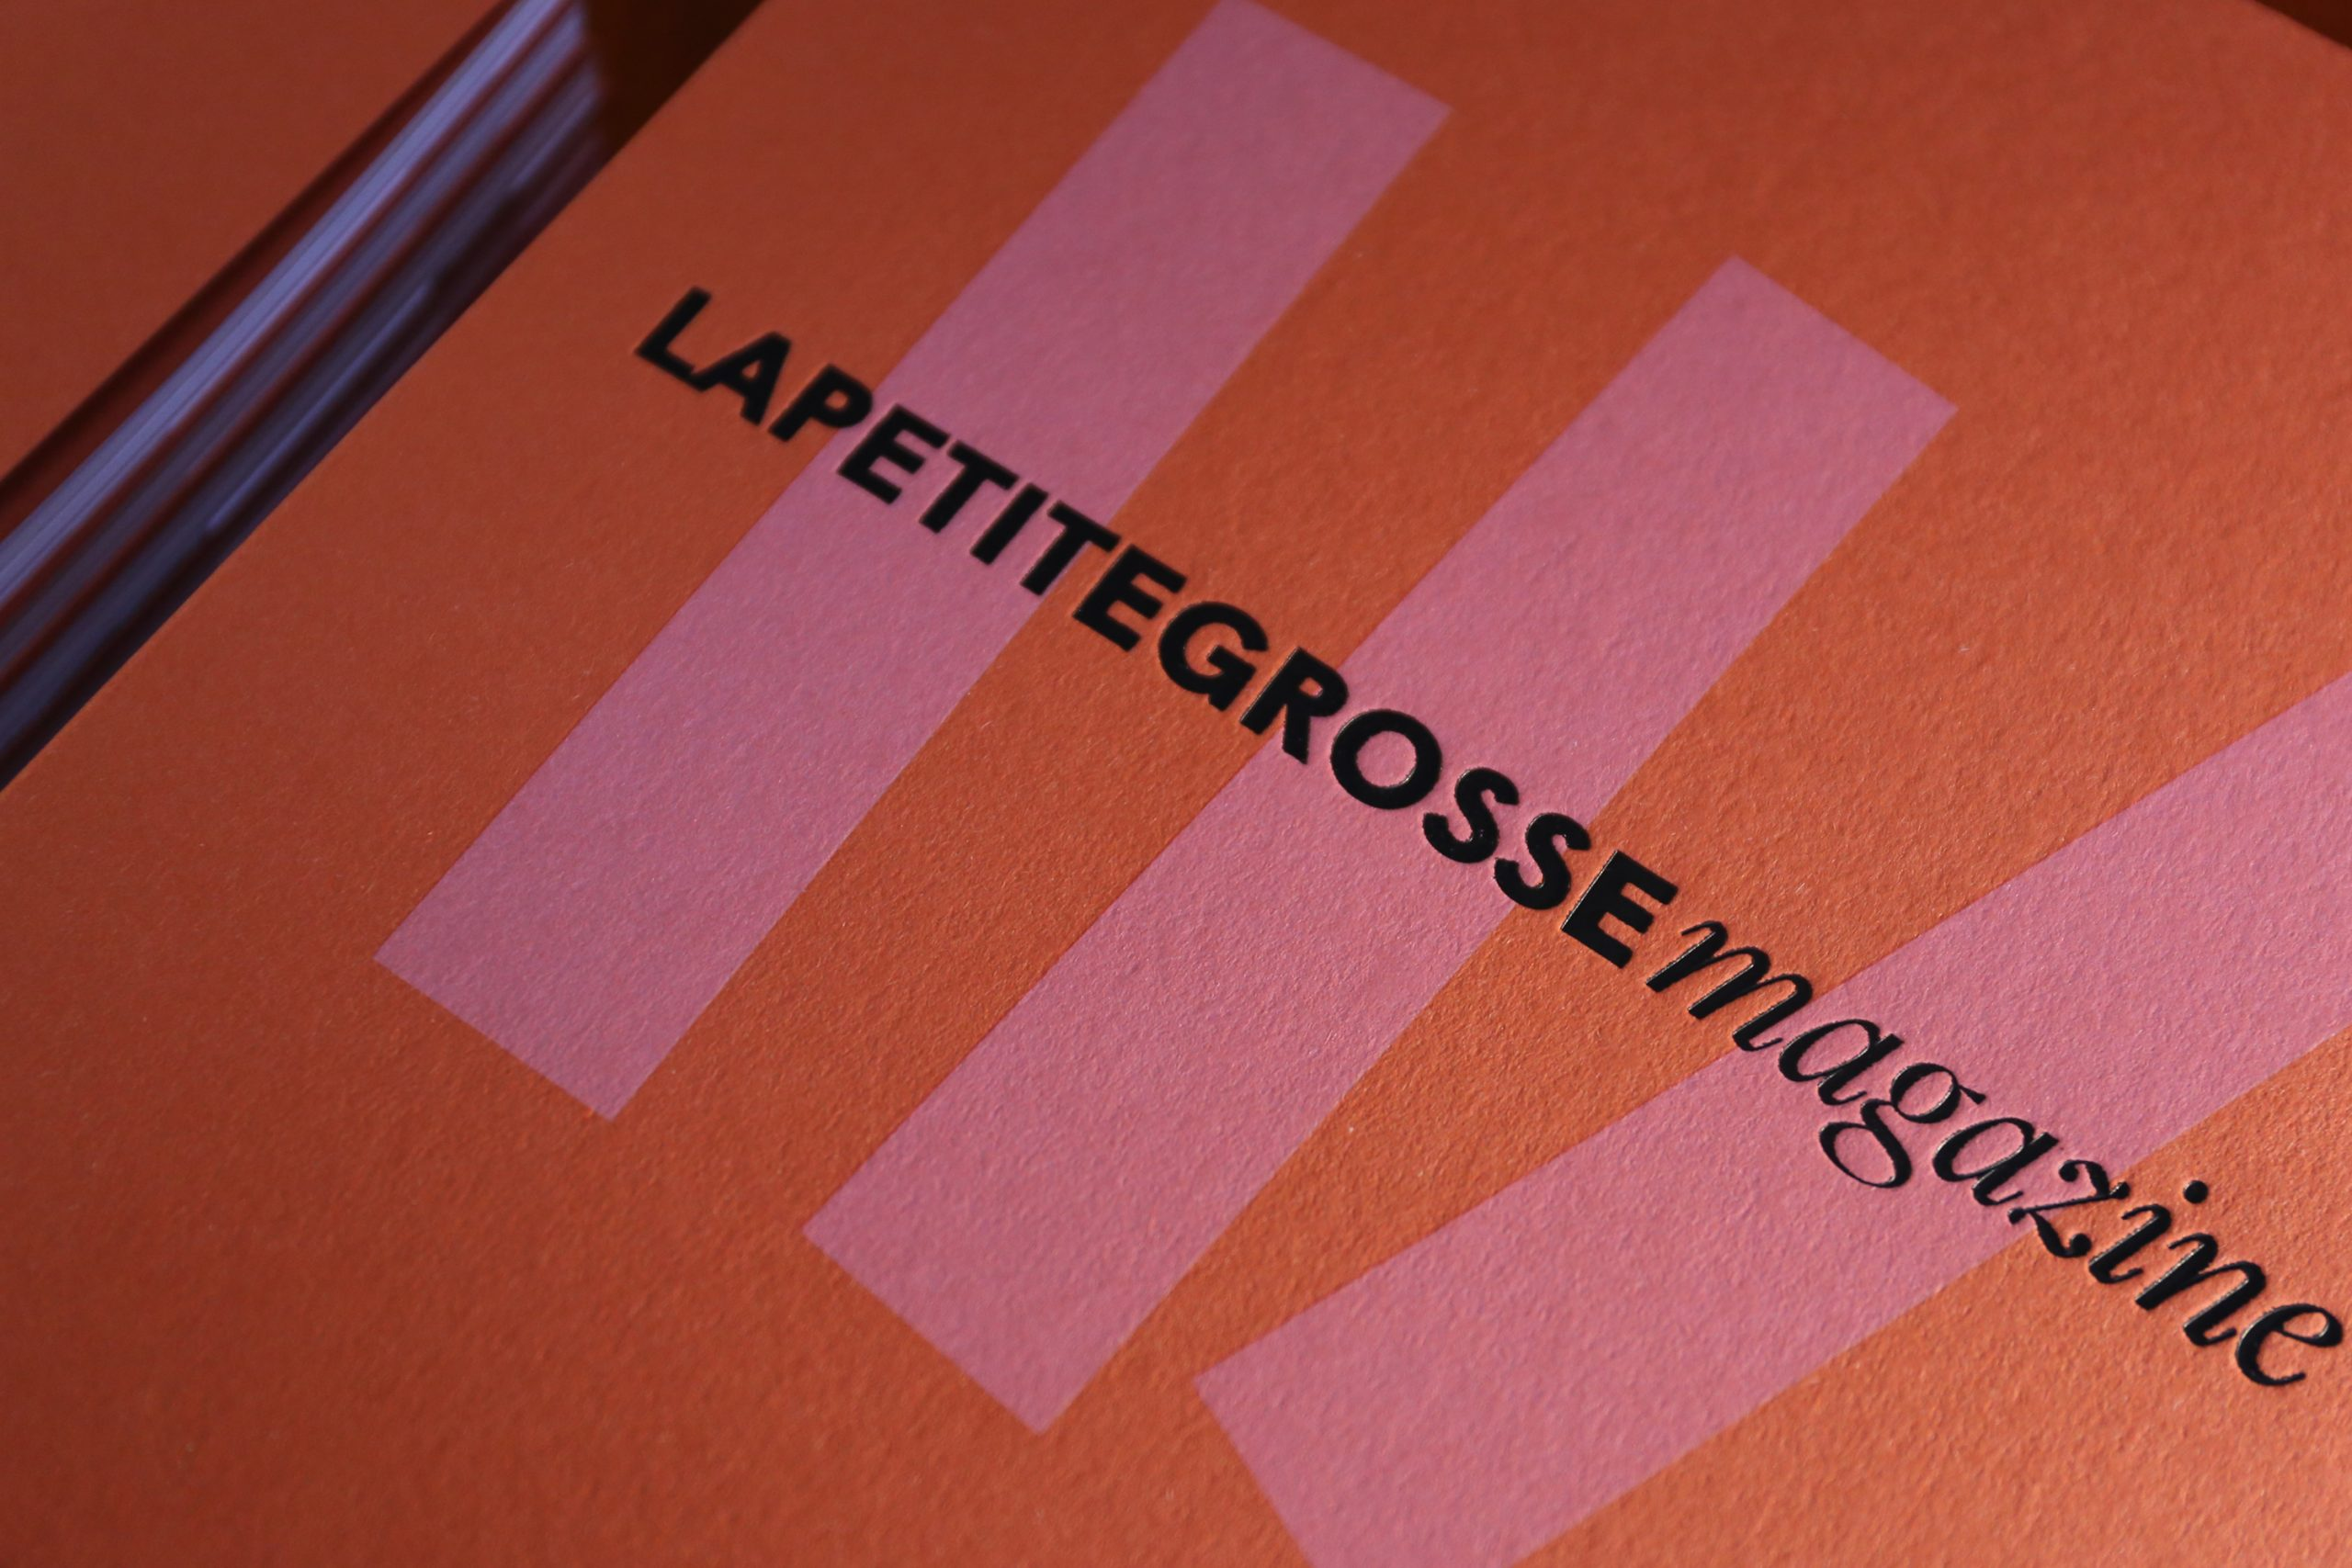 Lapetitegrosse Magazine 3